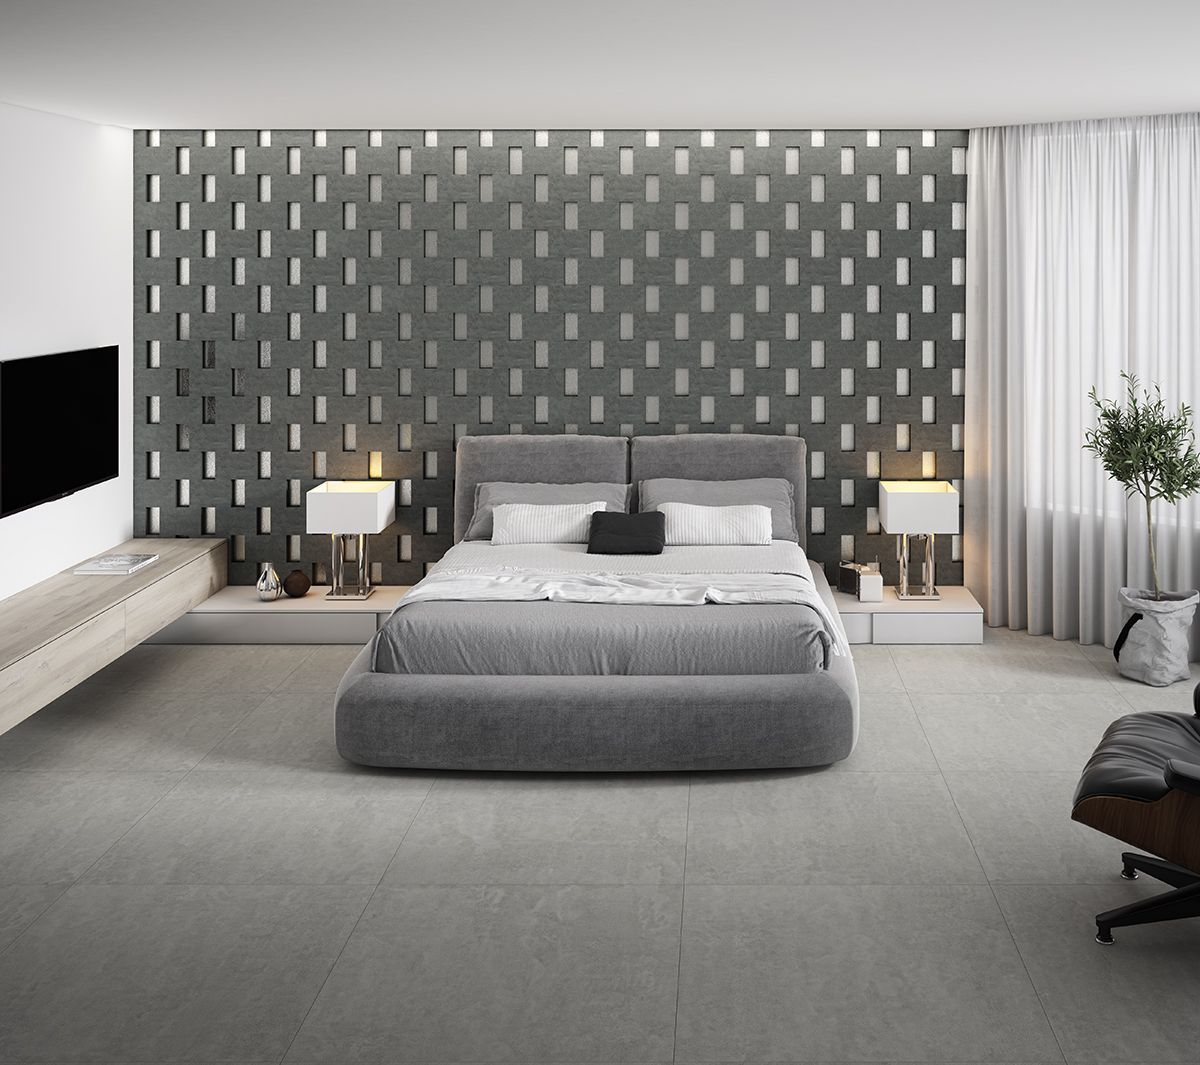 Apavisa Tiles Grey Floor Tiles Tile Bedroom House Flooring